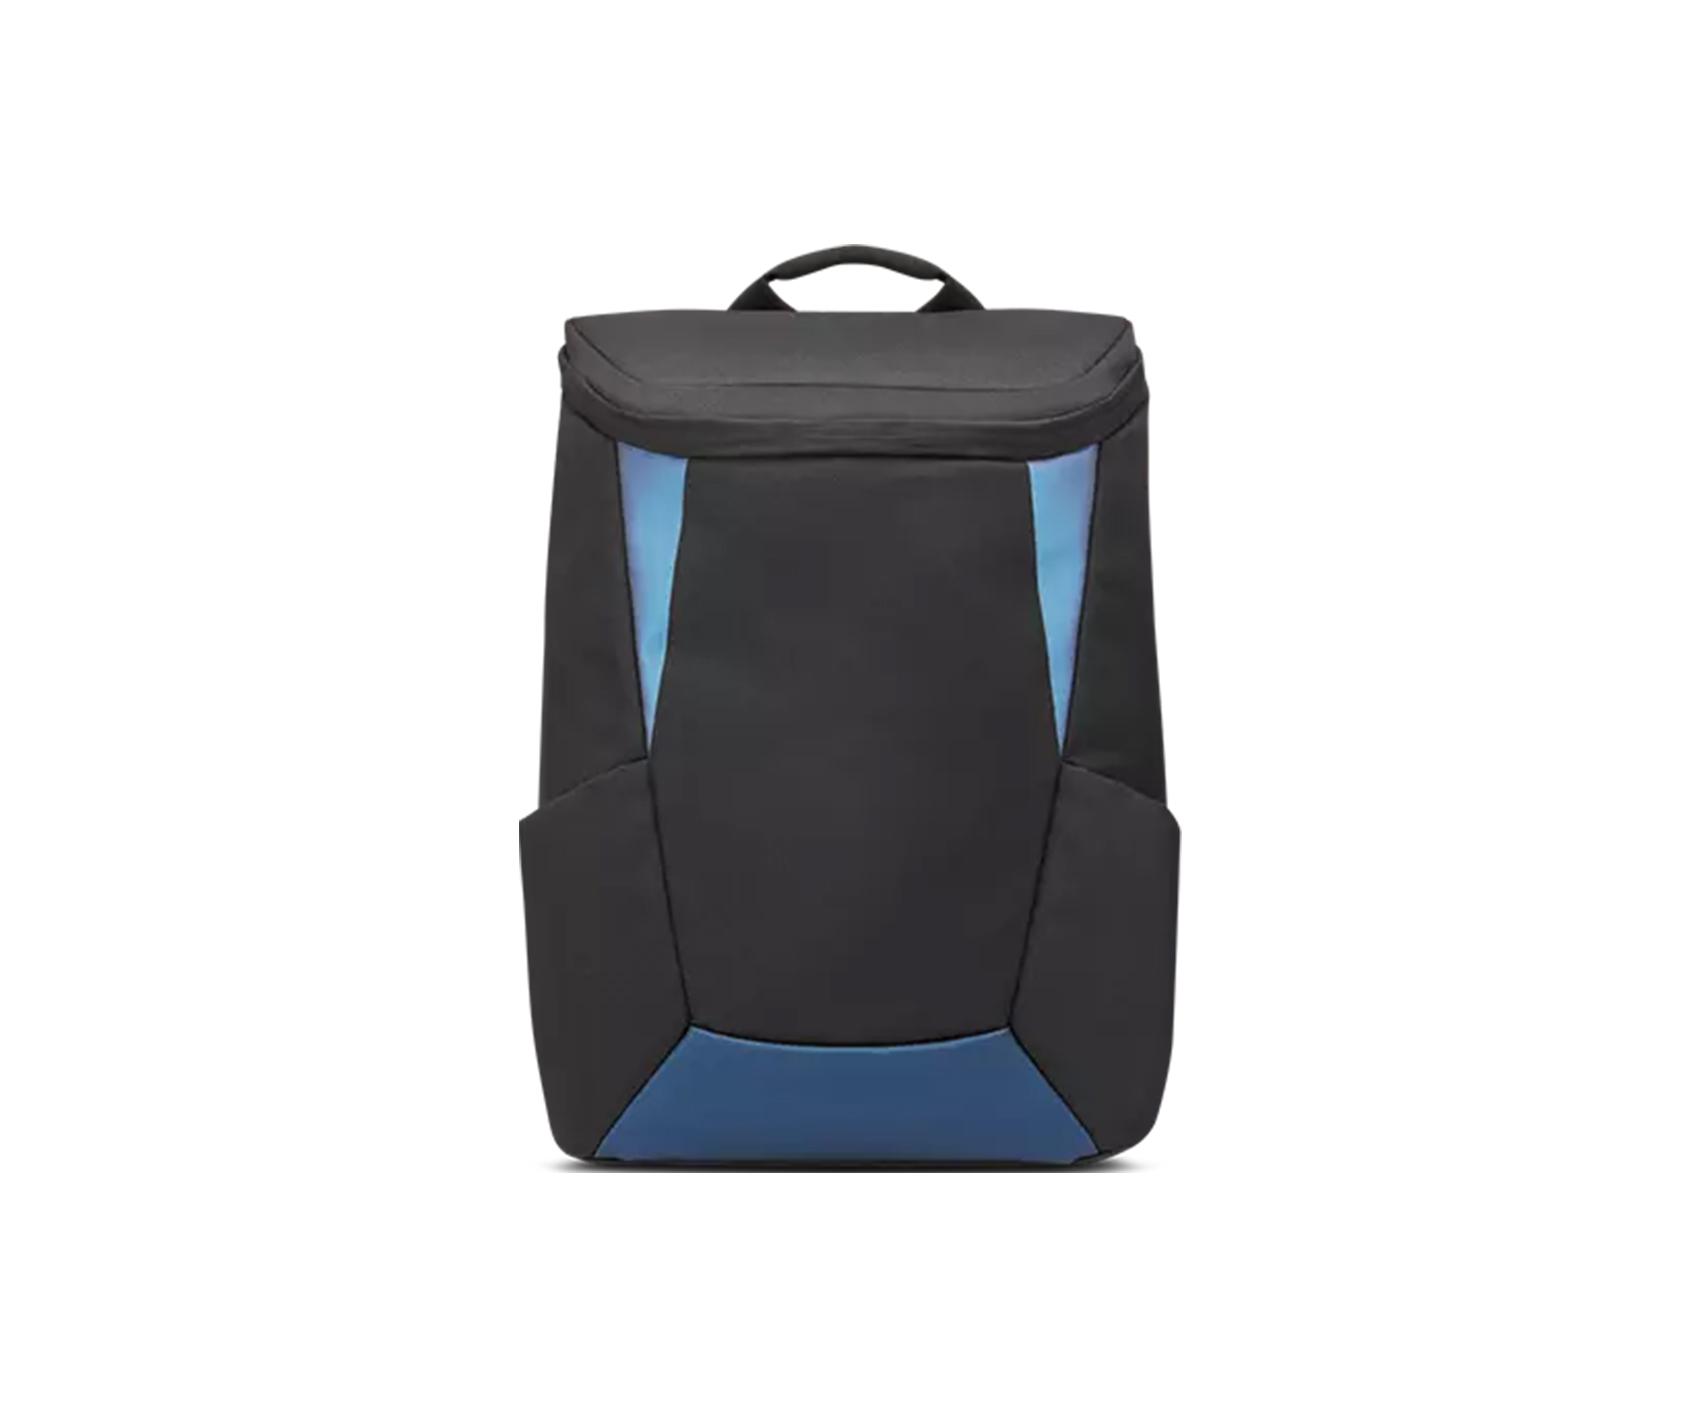 Lenovo Ideapad Gaming bag